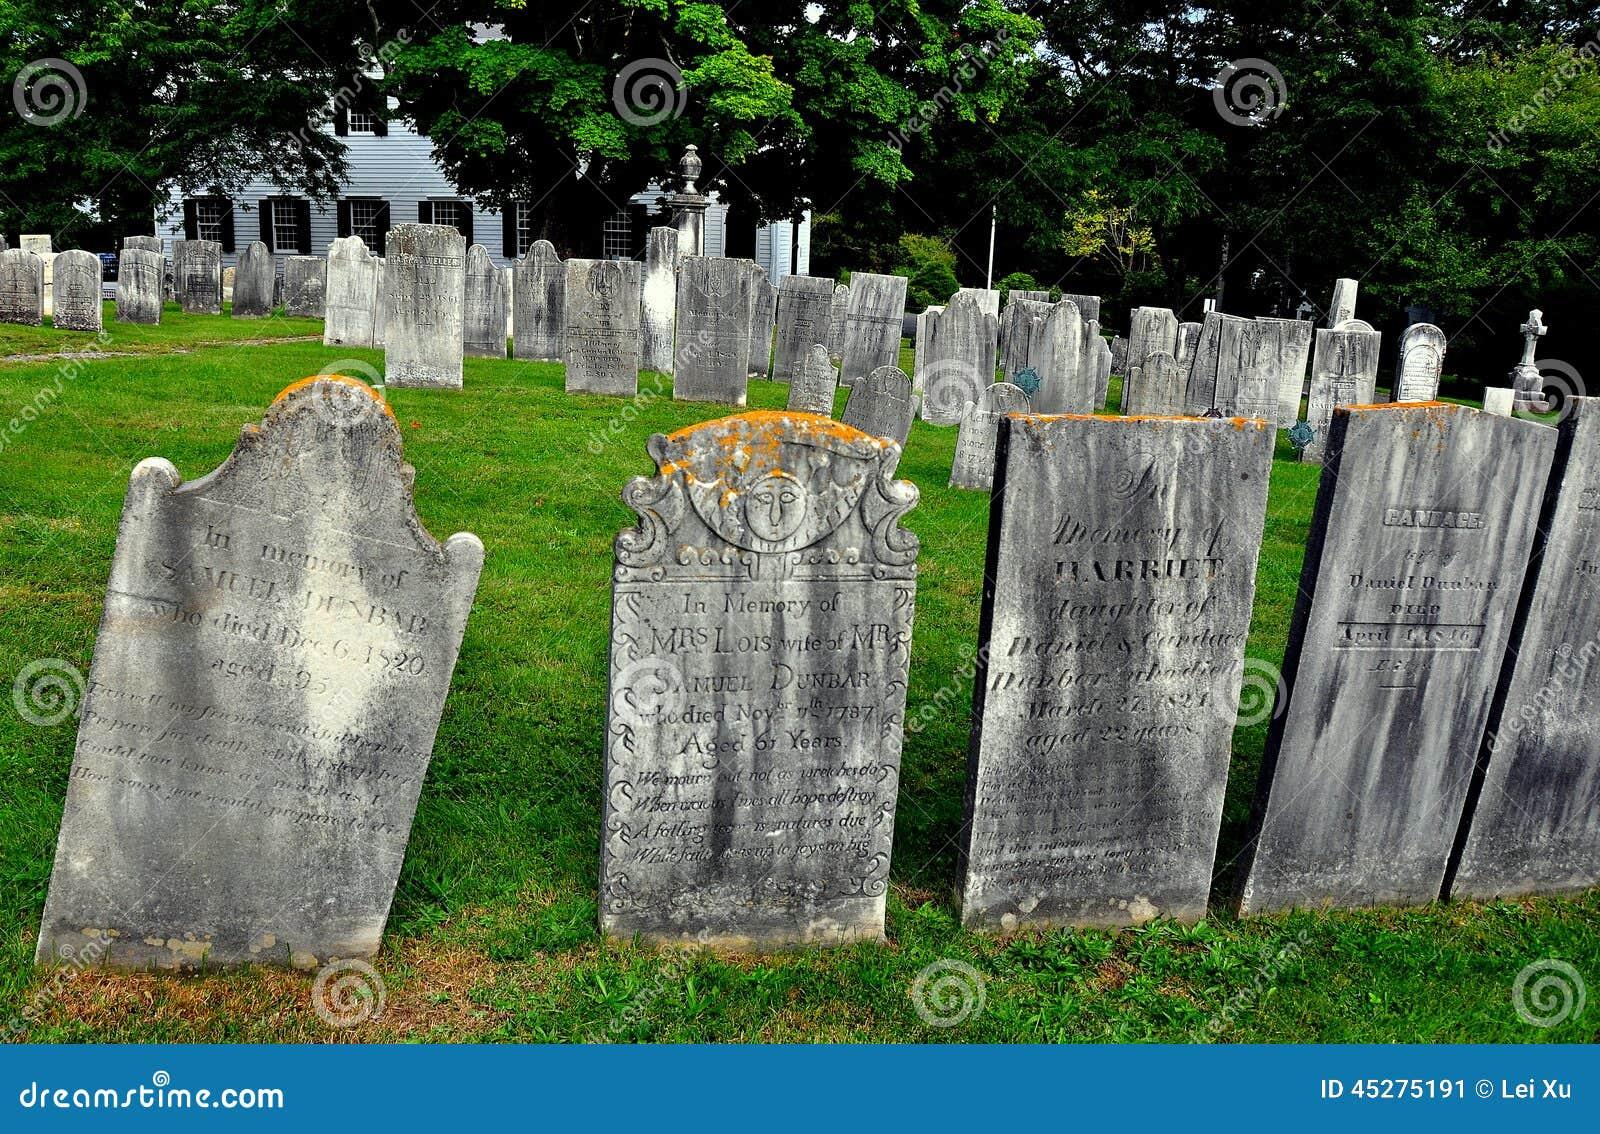 Lenox, MA: Gravestones at Church on the Hill